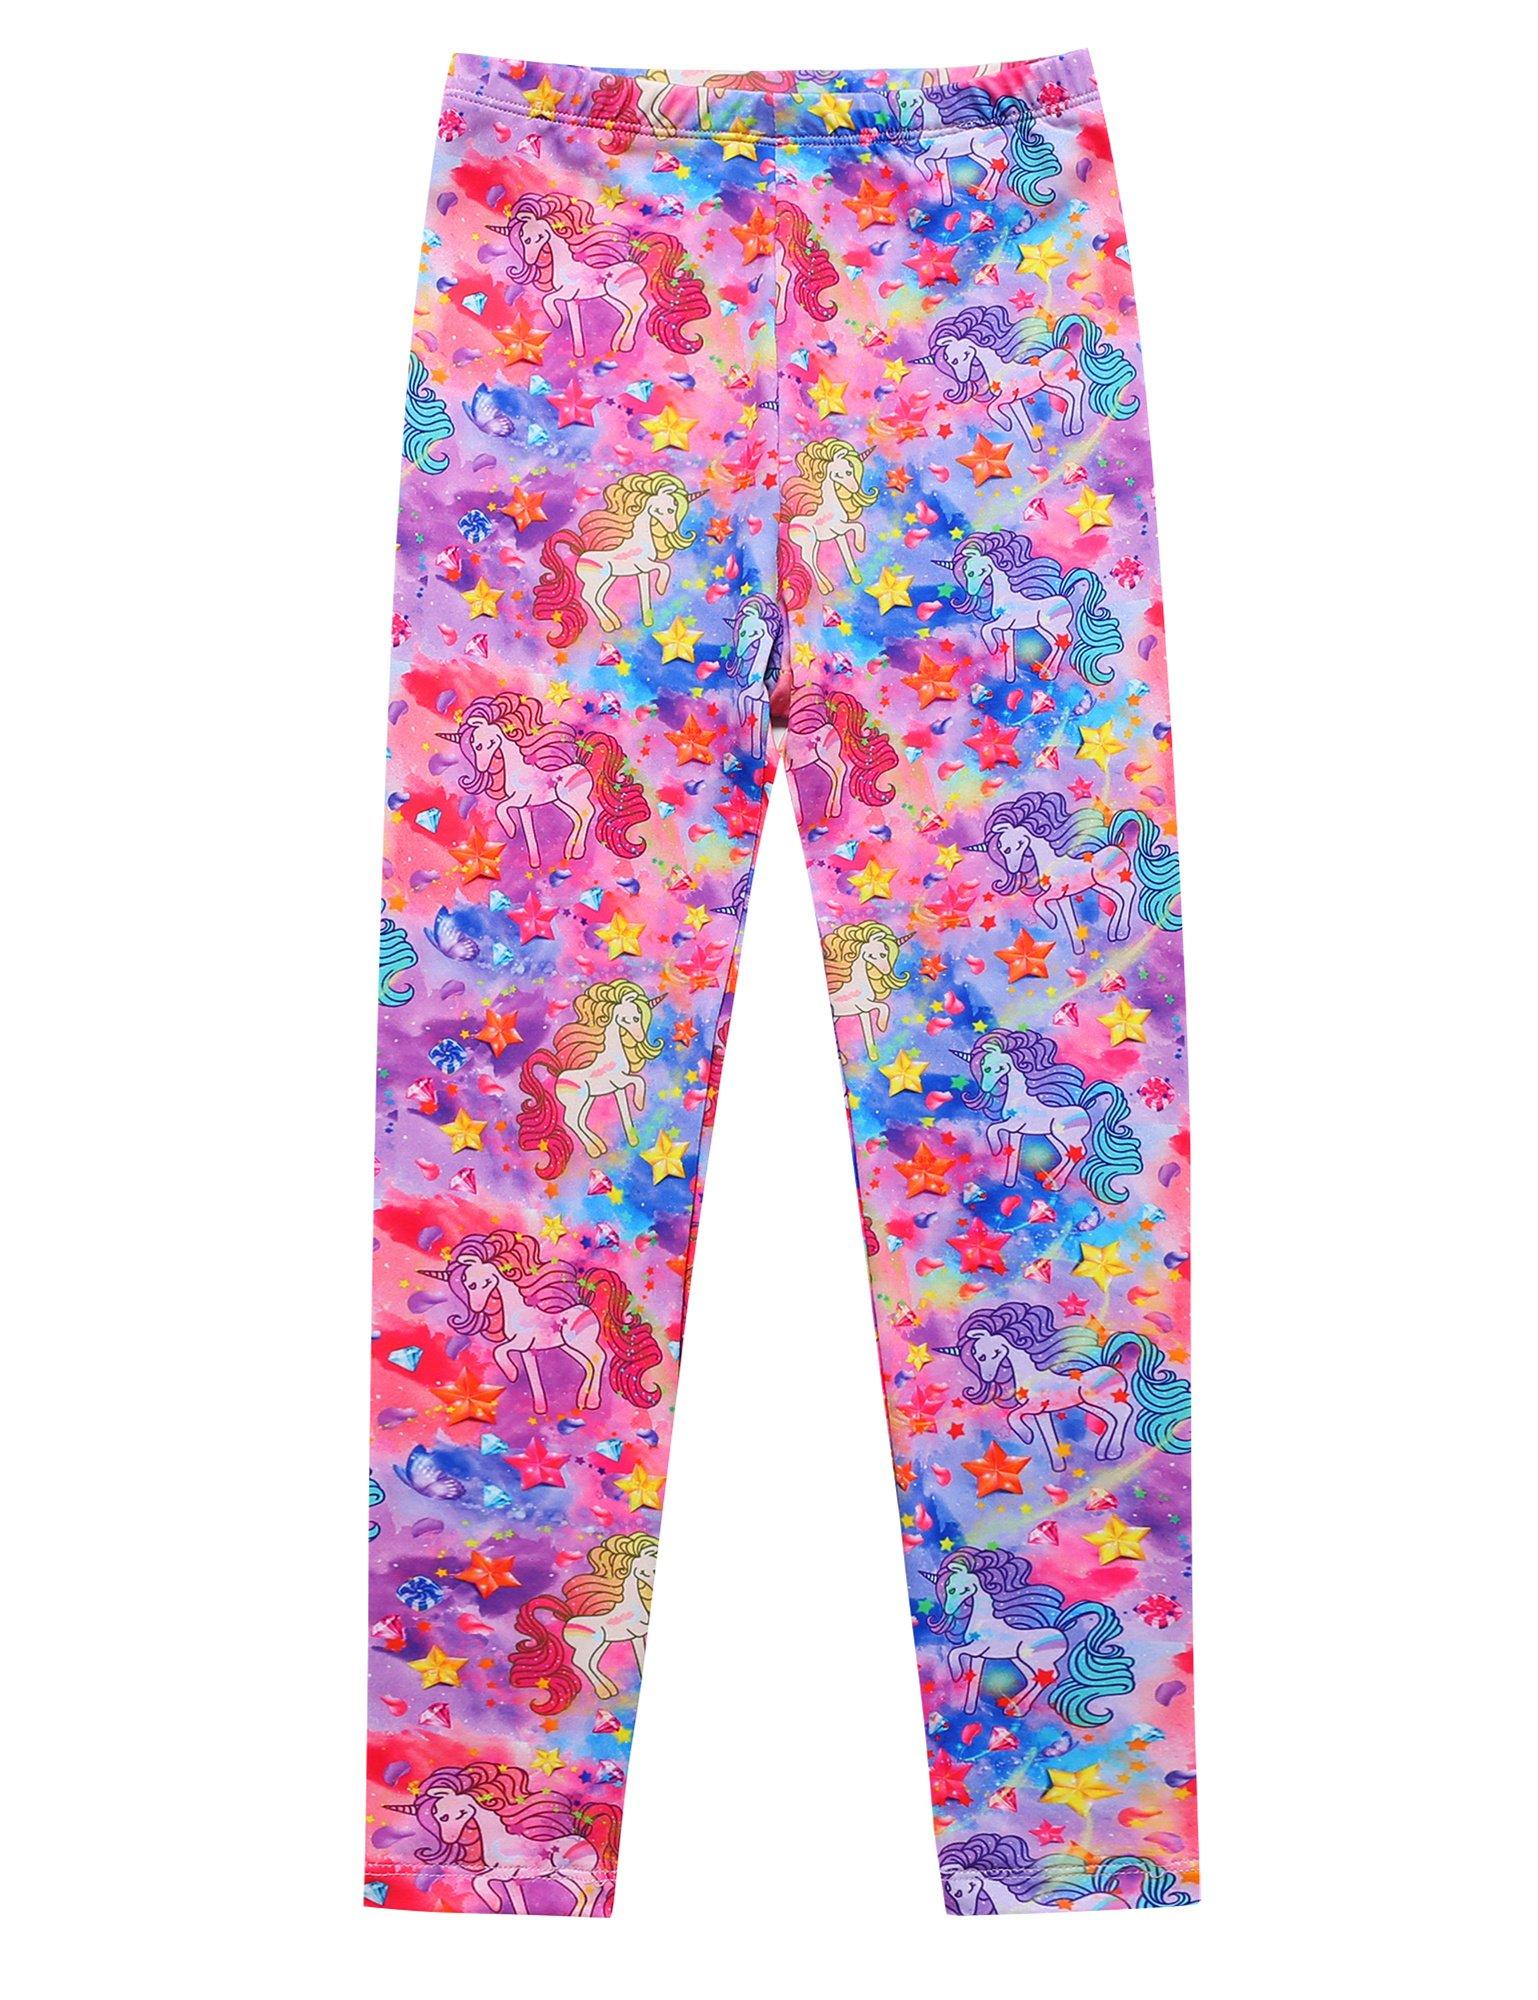 Jxstar Girls Pants Unicorn Printed Trousers Ankle Length Basic Leggings Unicorn Fantasy 130